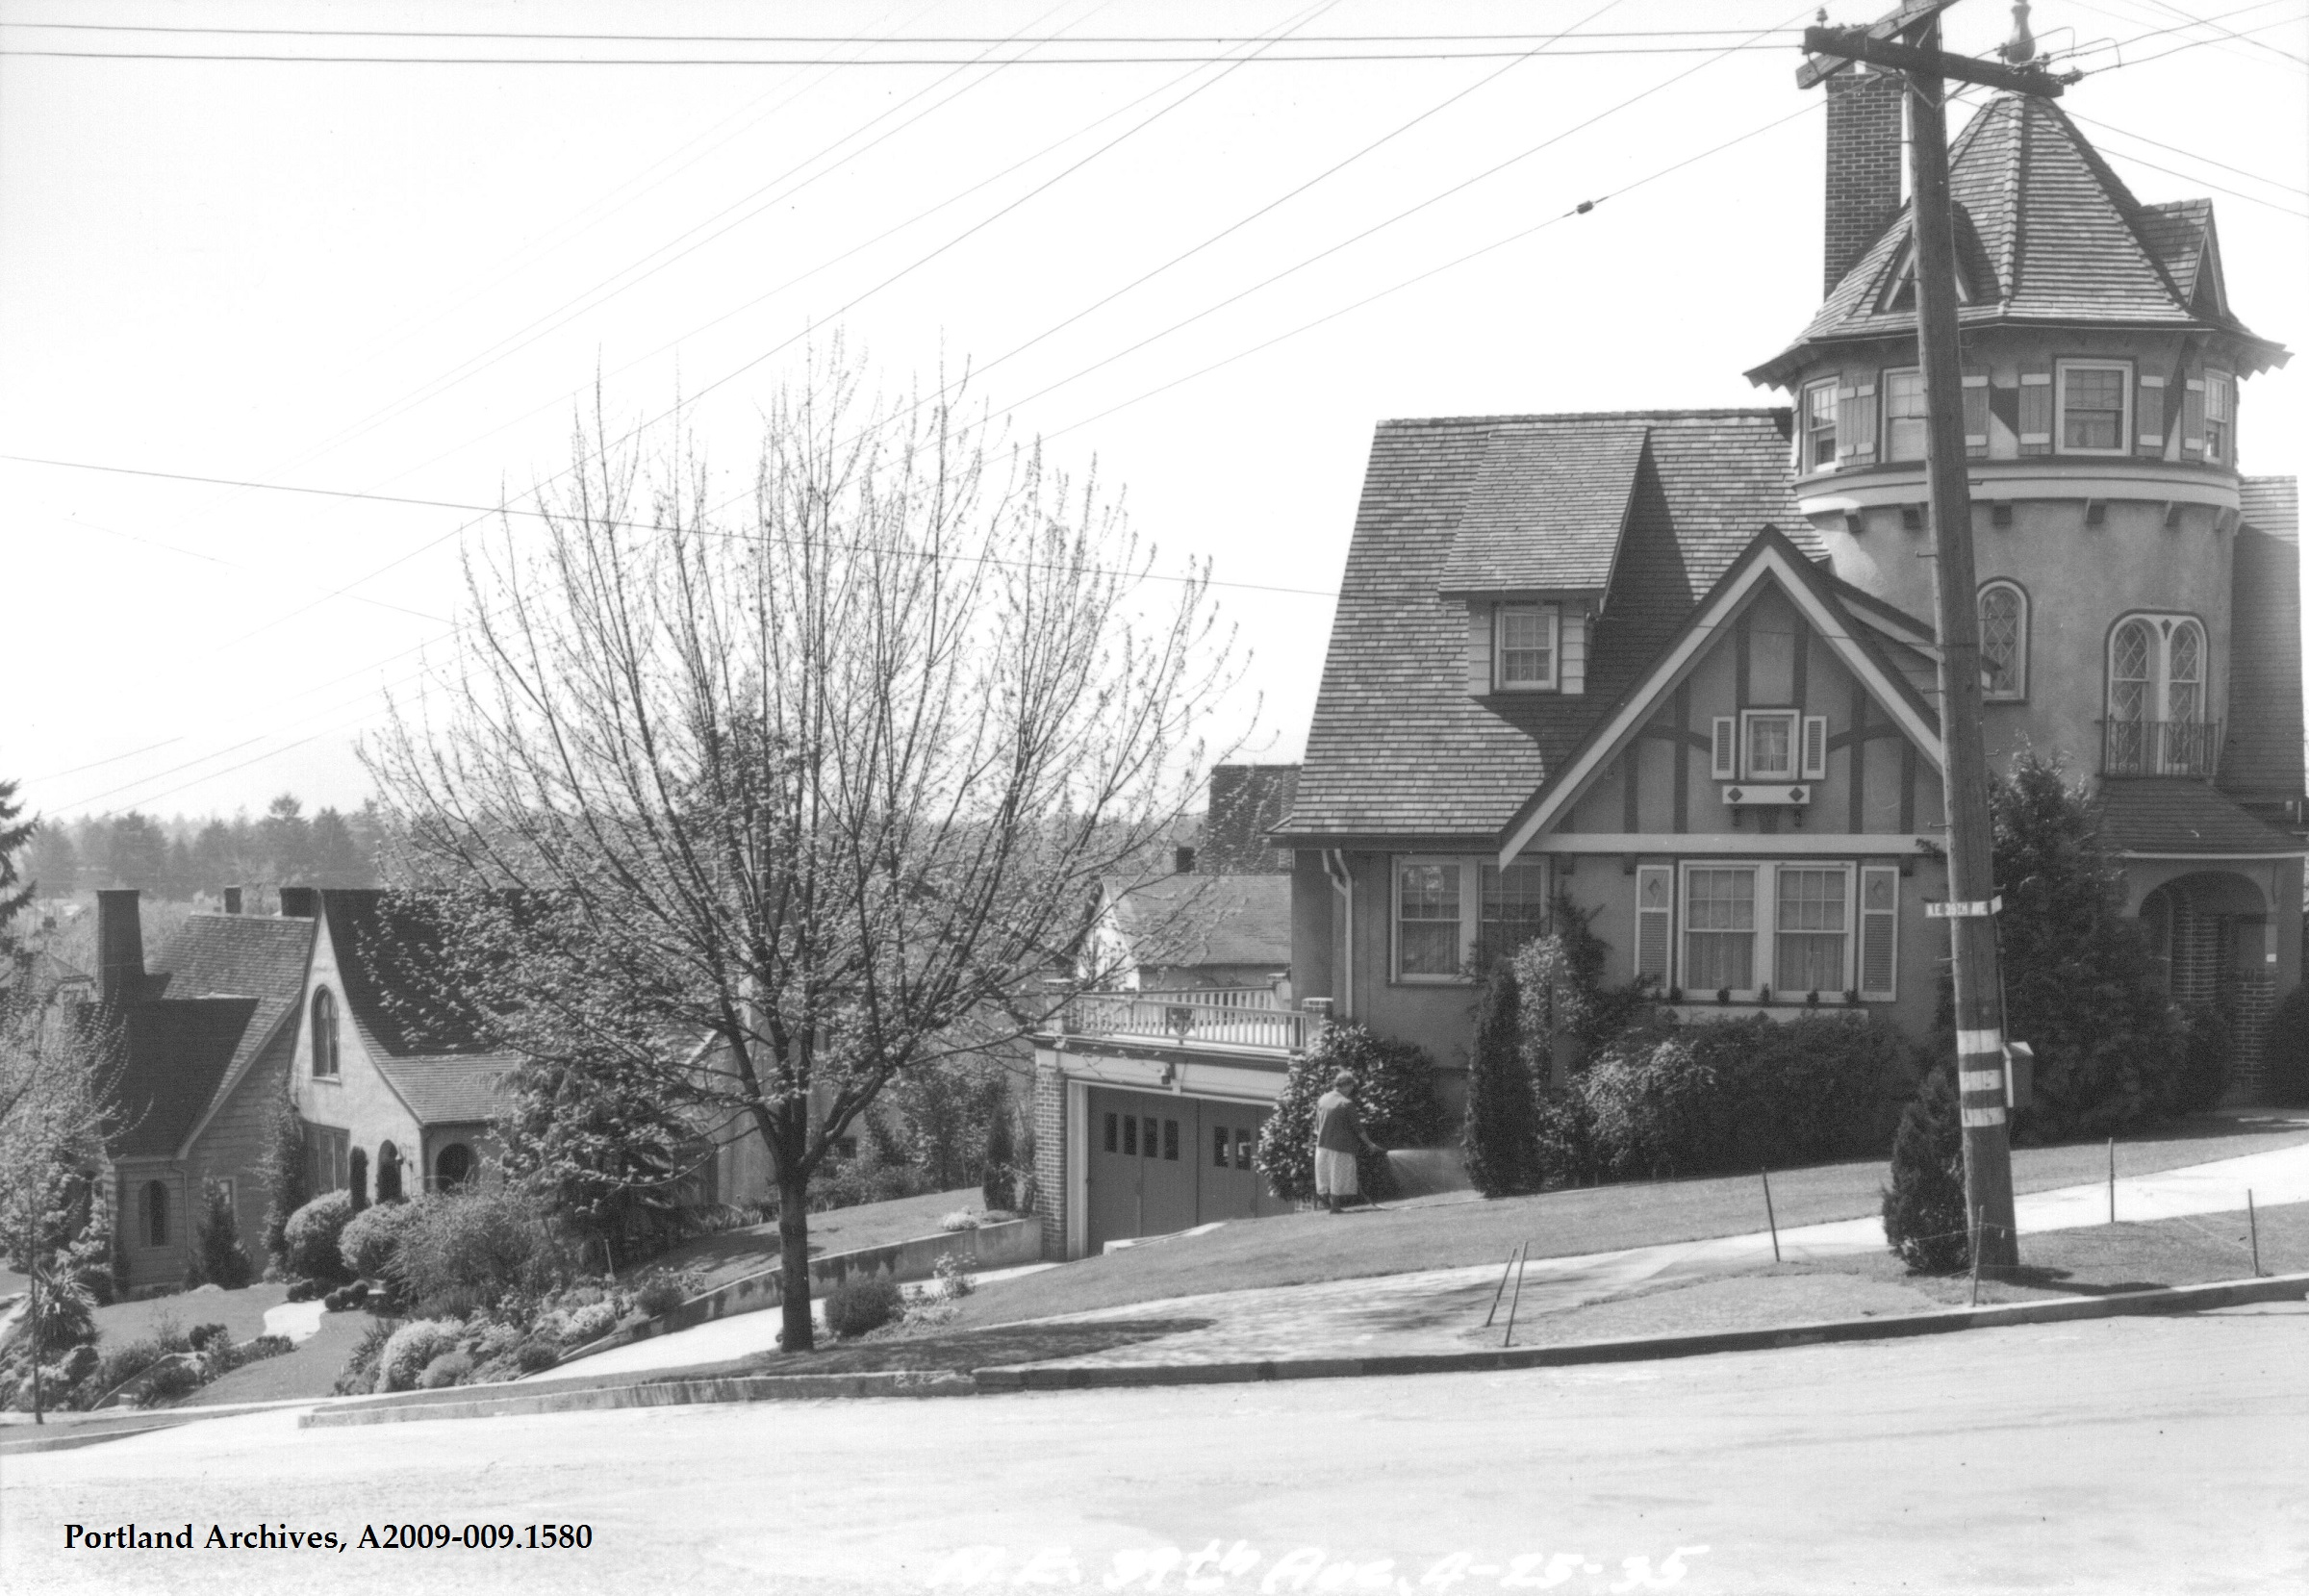 City of Portland Archives, Oregon, A2009-009.1580